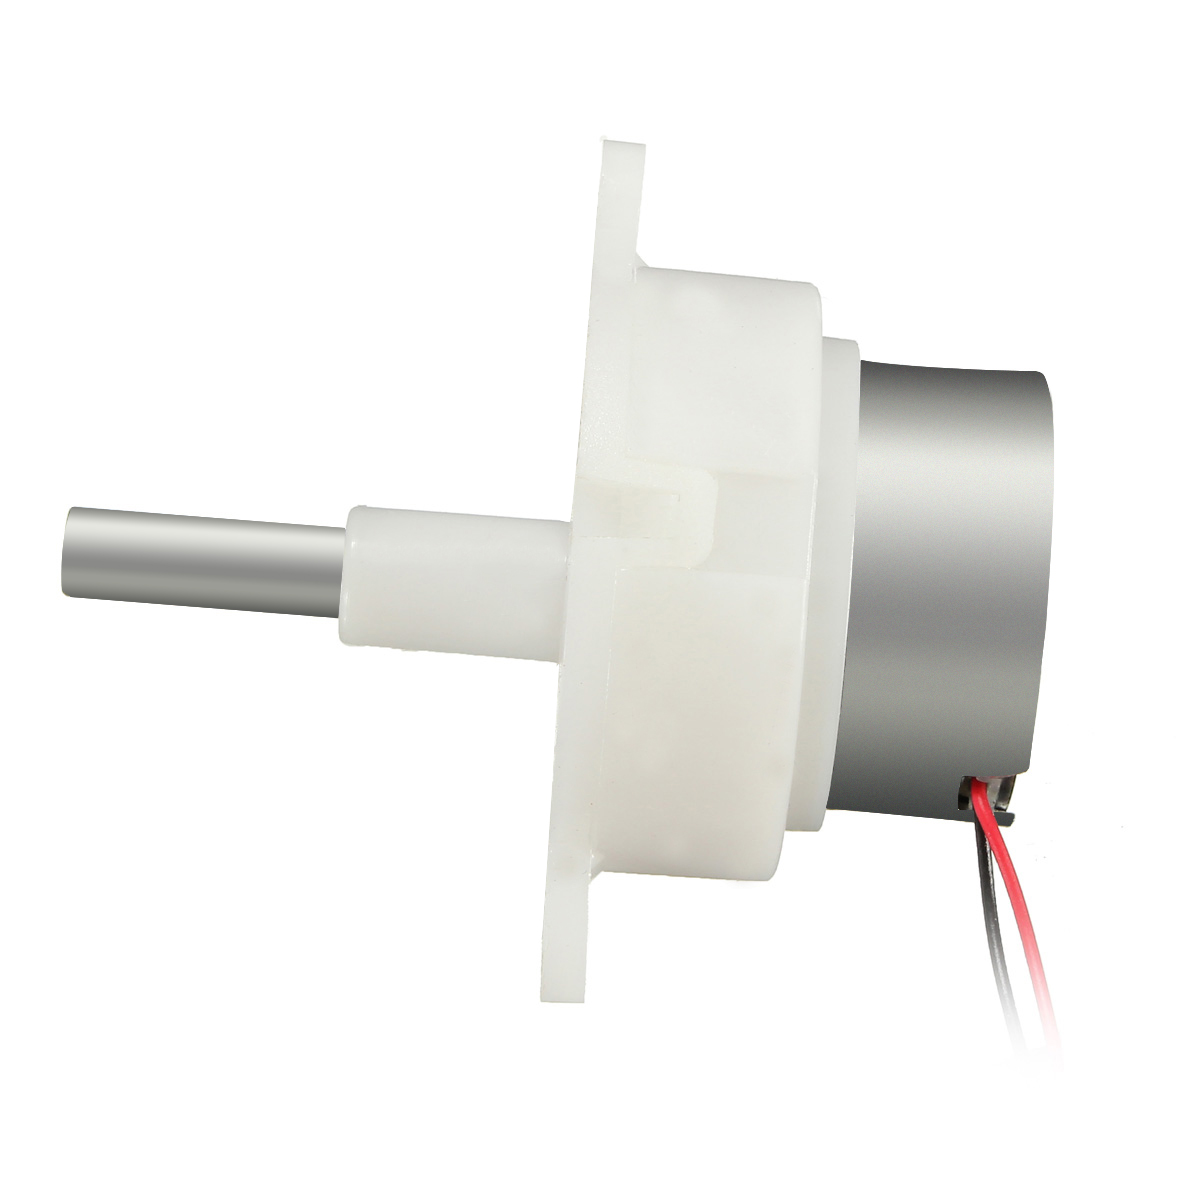 2pcs DC 6v 12v Worm Gear Motor long shaft Slow speed gearmotor 8-16RPM